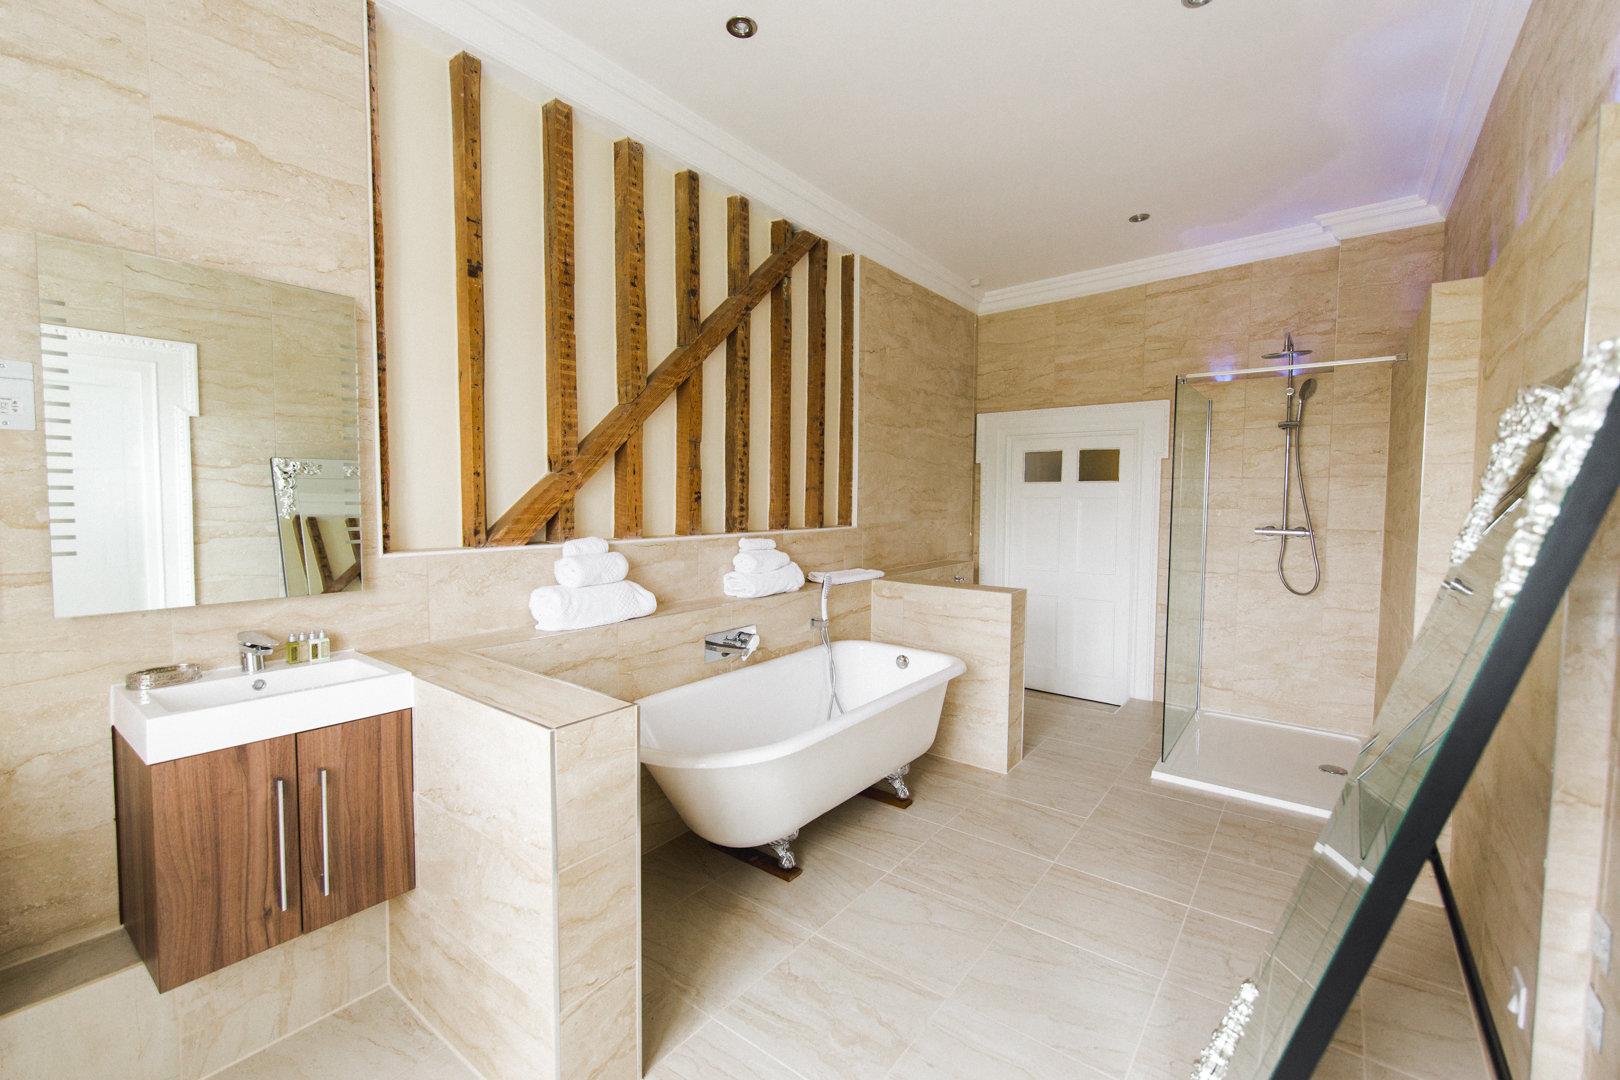 boreham house bathroom